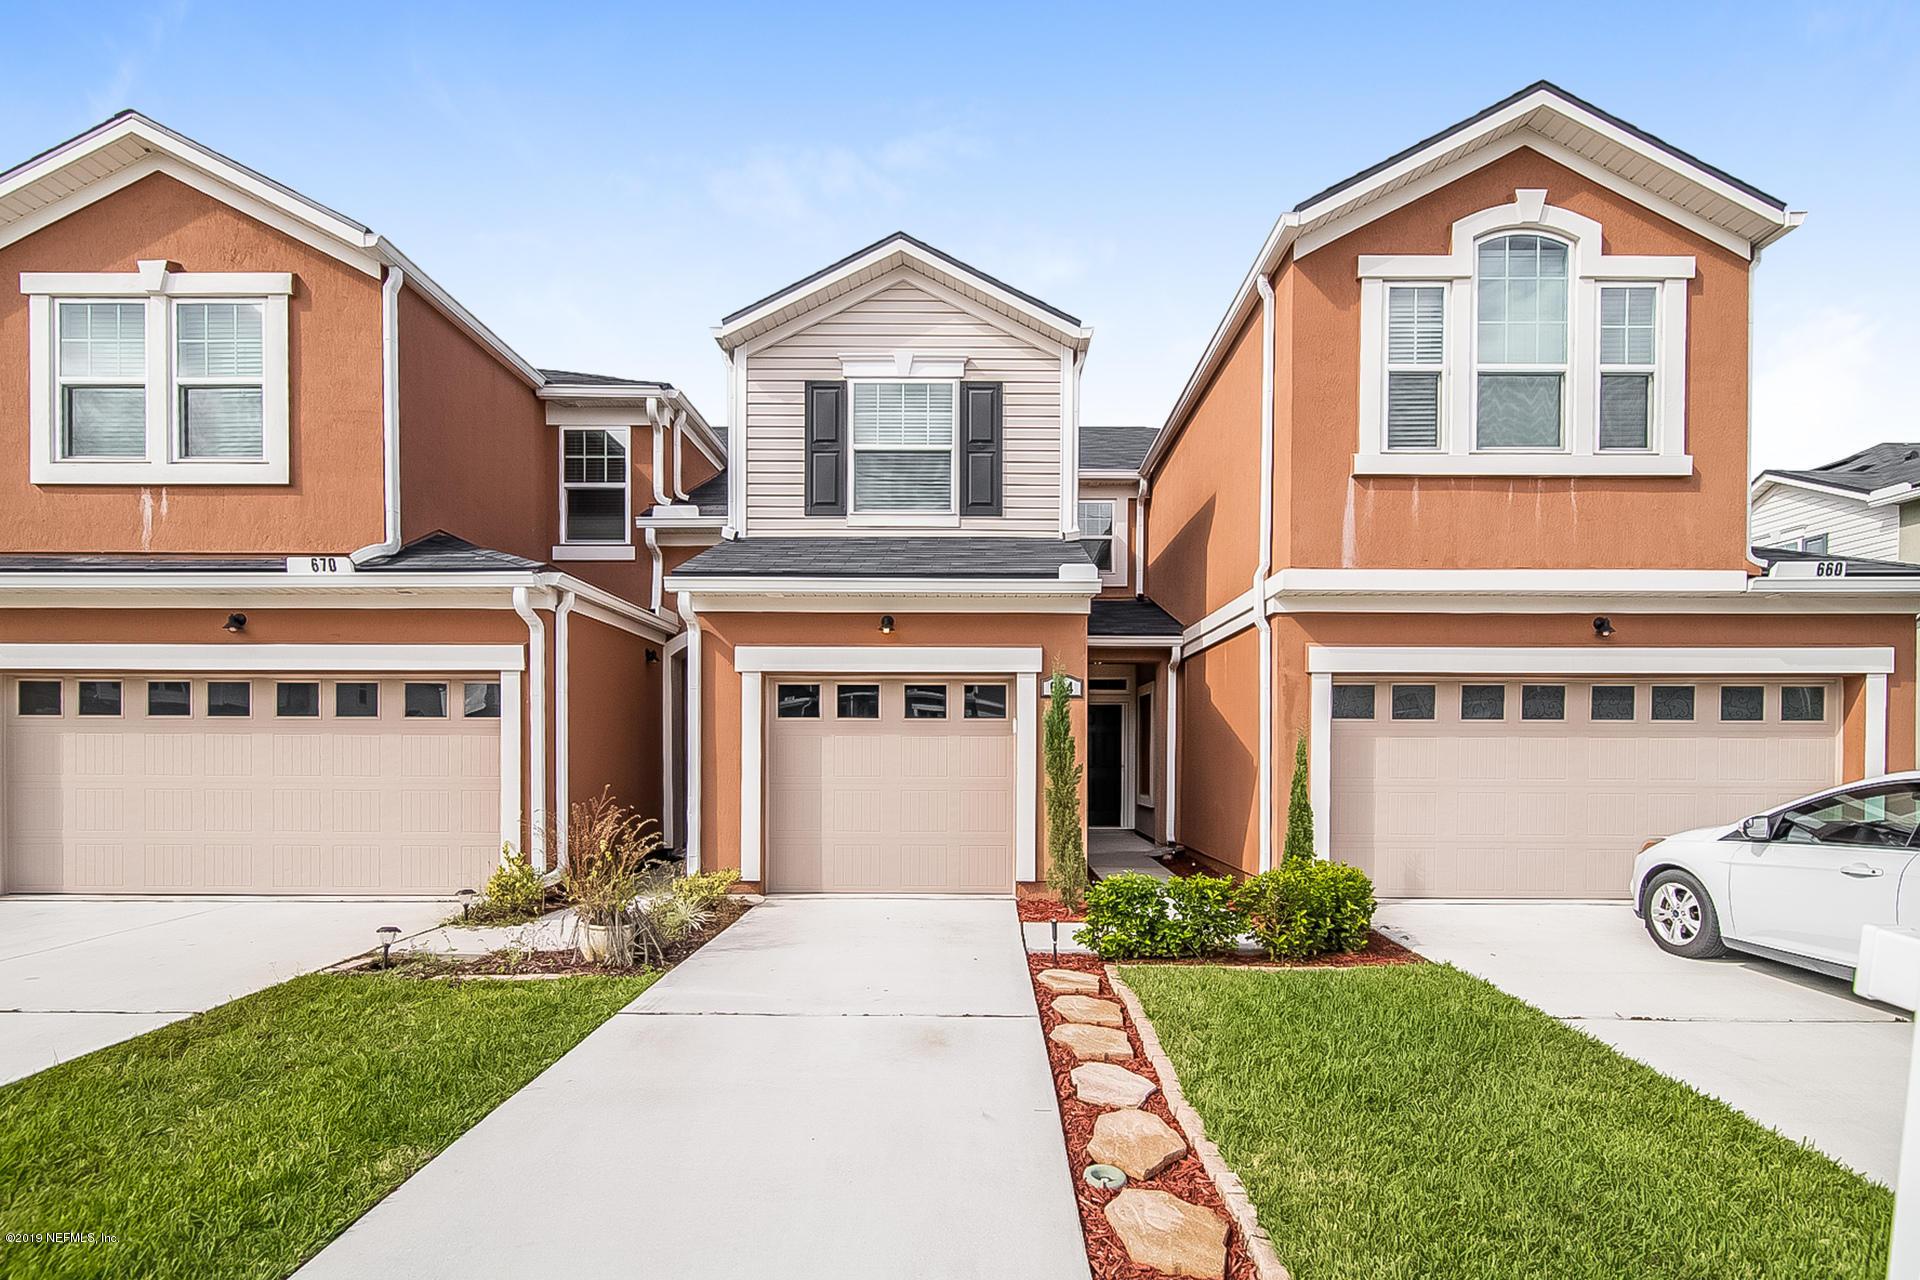 664 REESE, ORANGE PARK, FLORIDA 32065, 3 Bedrooms Bedrooms, ,2 BathroomsBathrooms,Residential - townhome,For sale,REESE,1021936